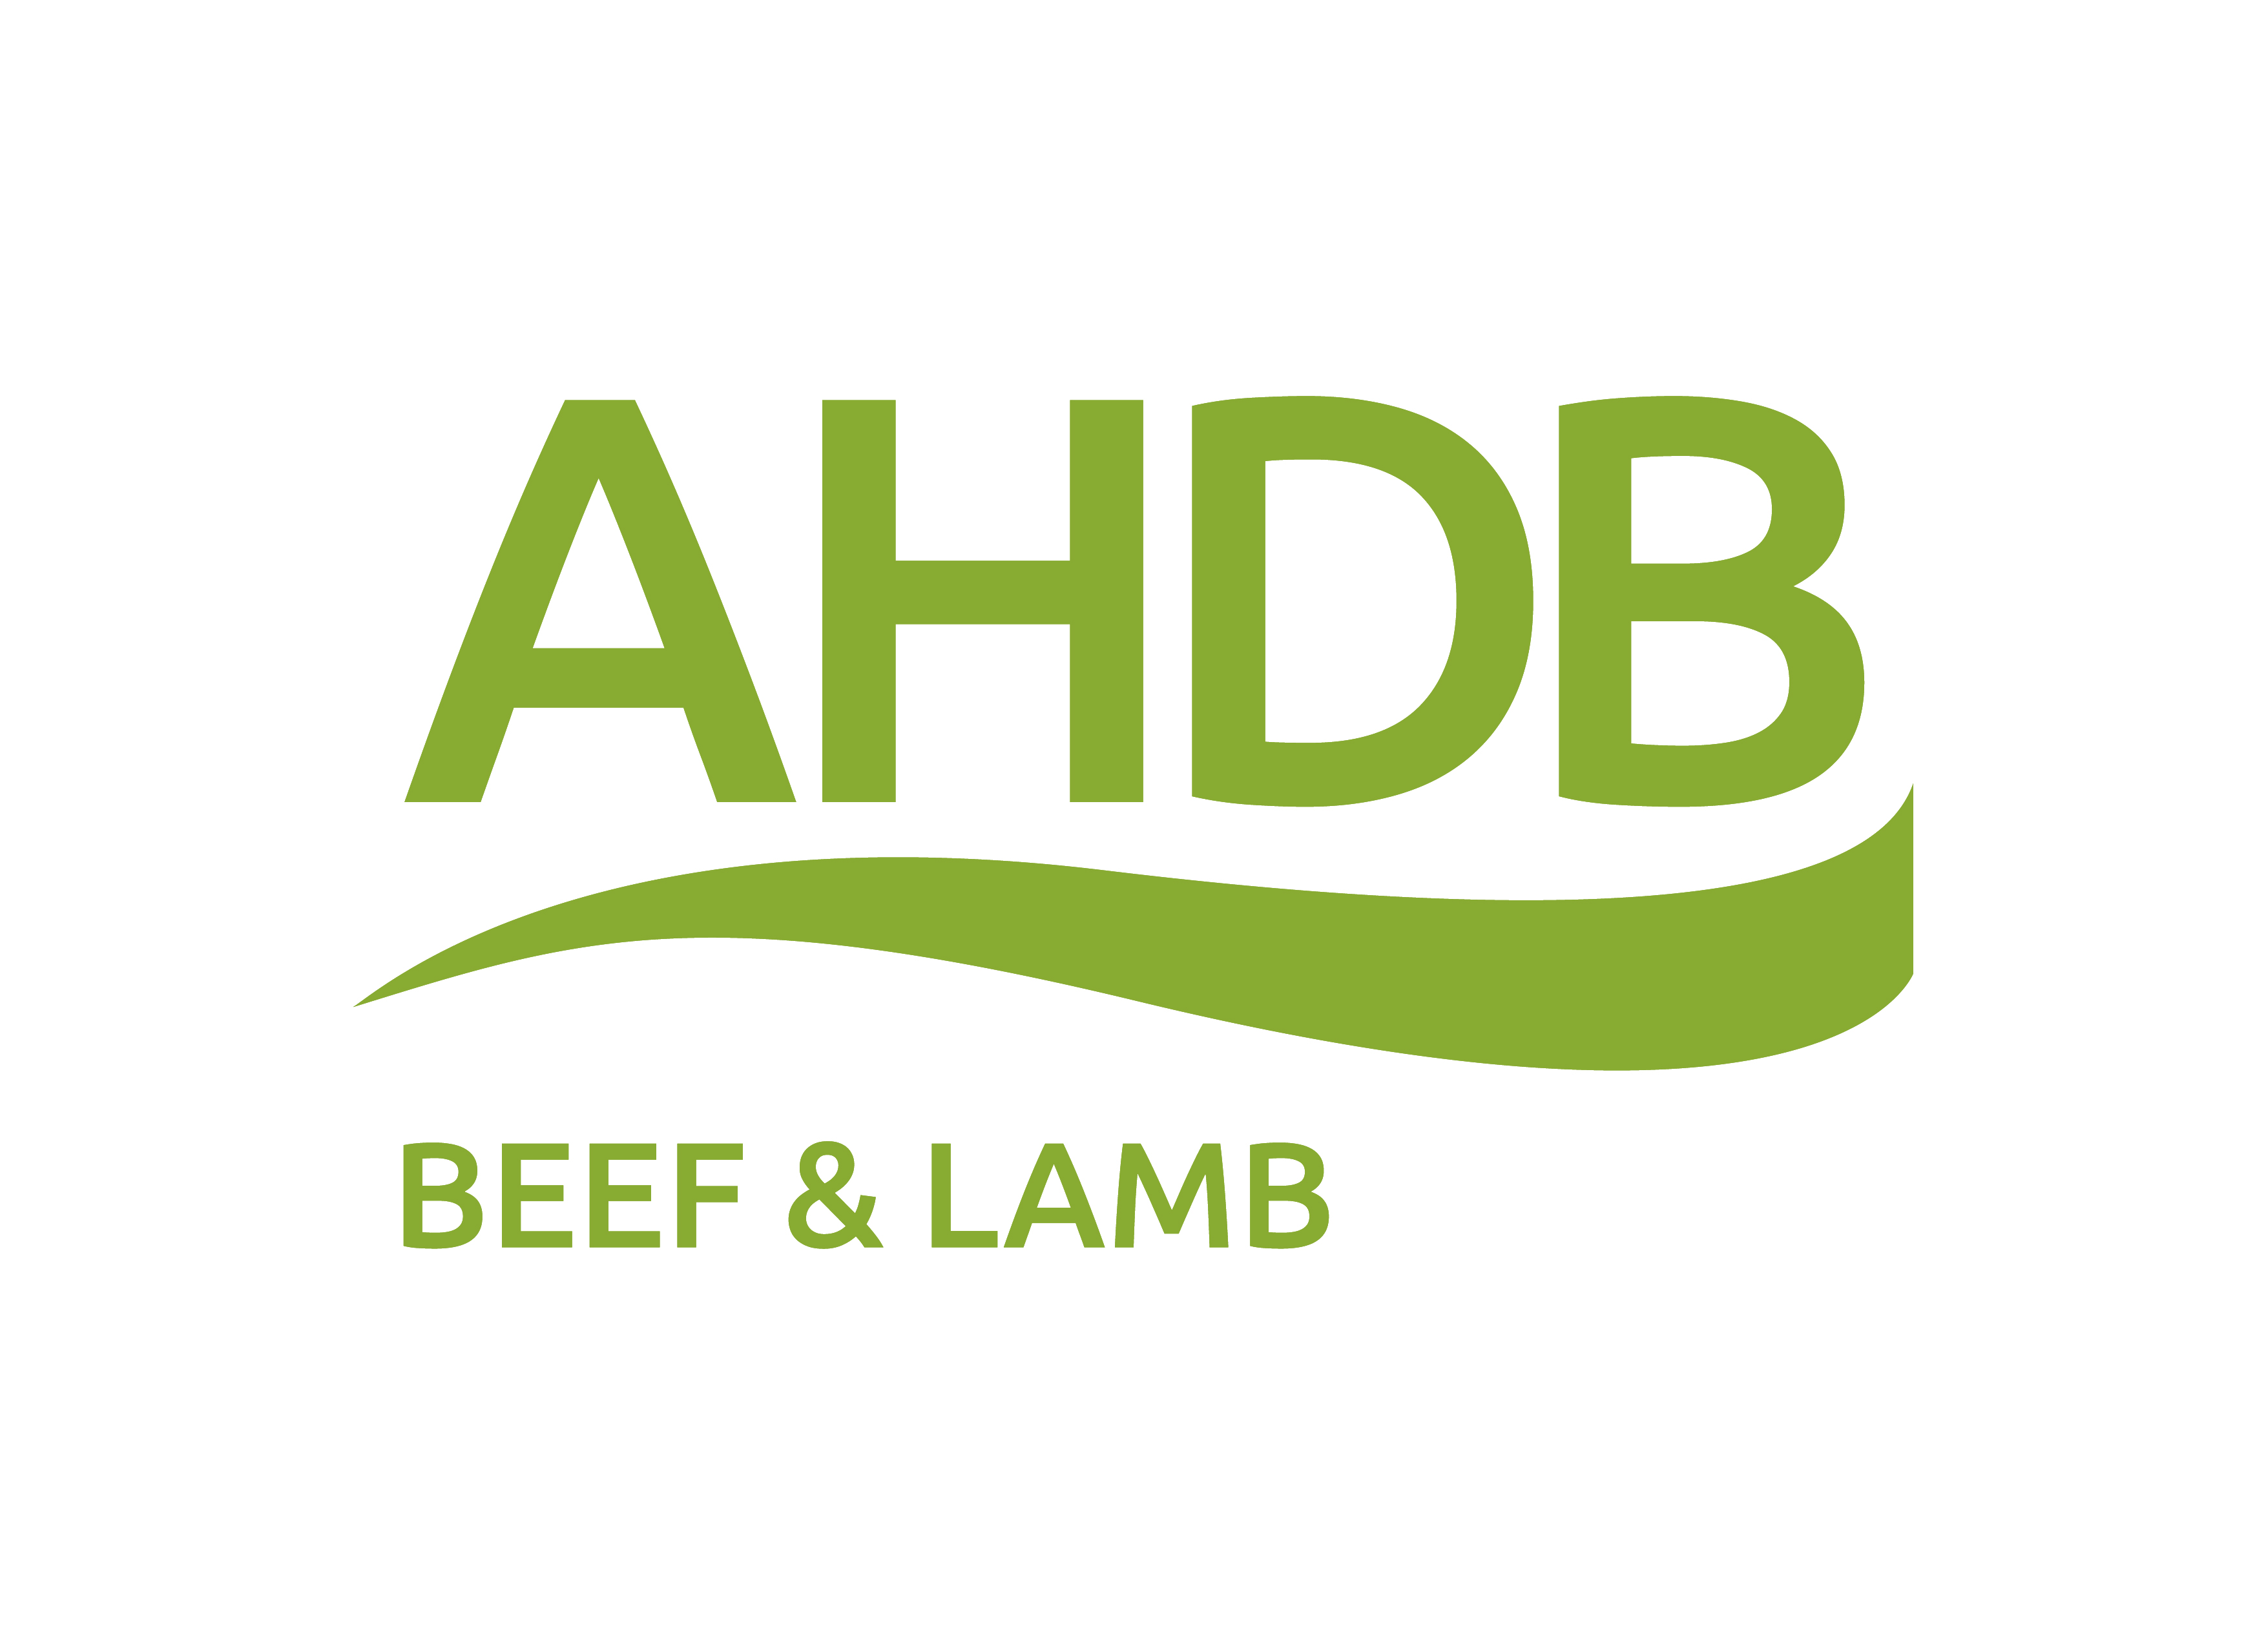 AHDB Beef and Lamb